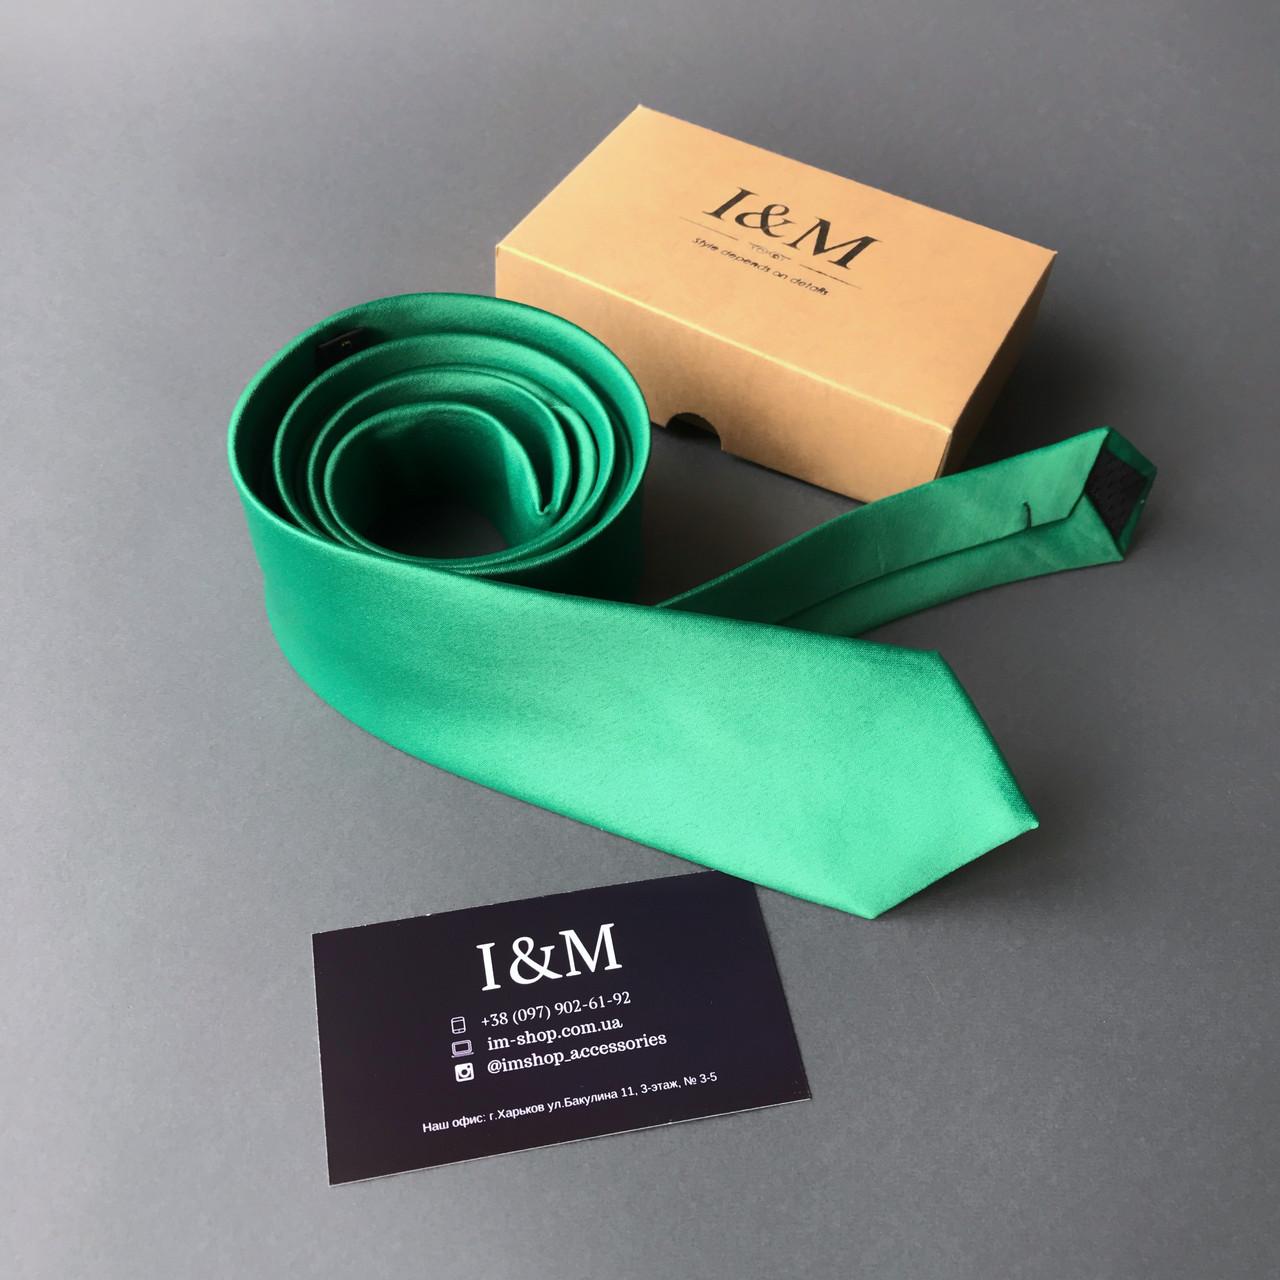 Галстук I&M Craft узкий изумрудный (020311)